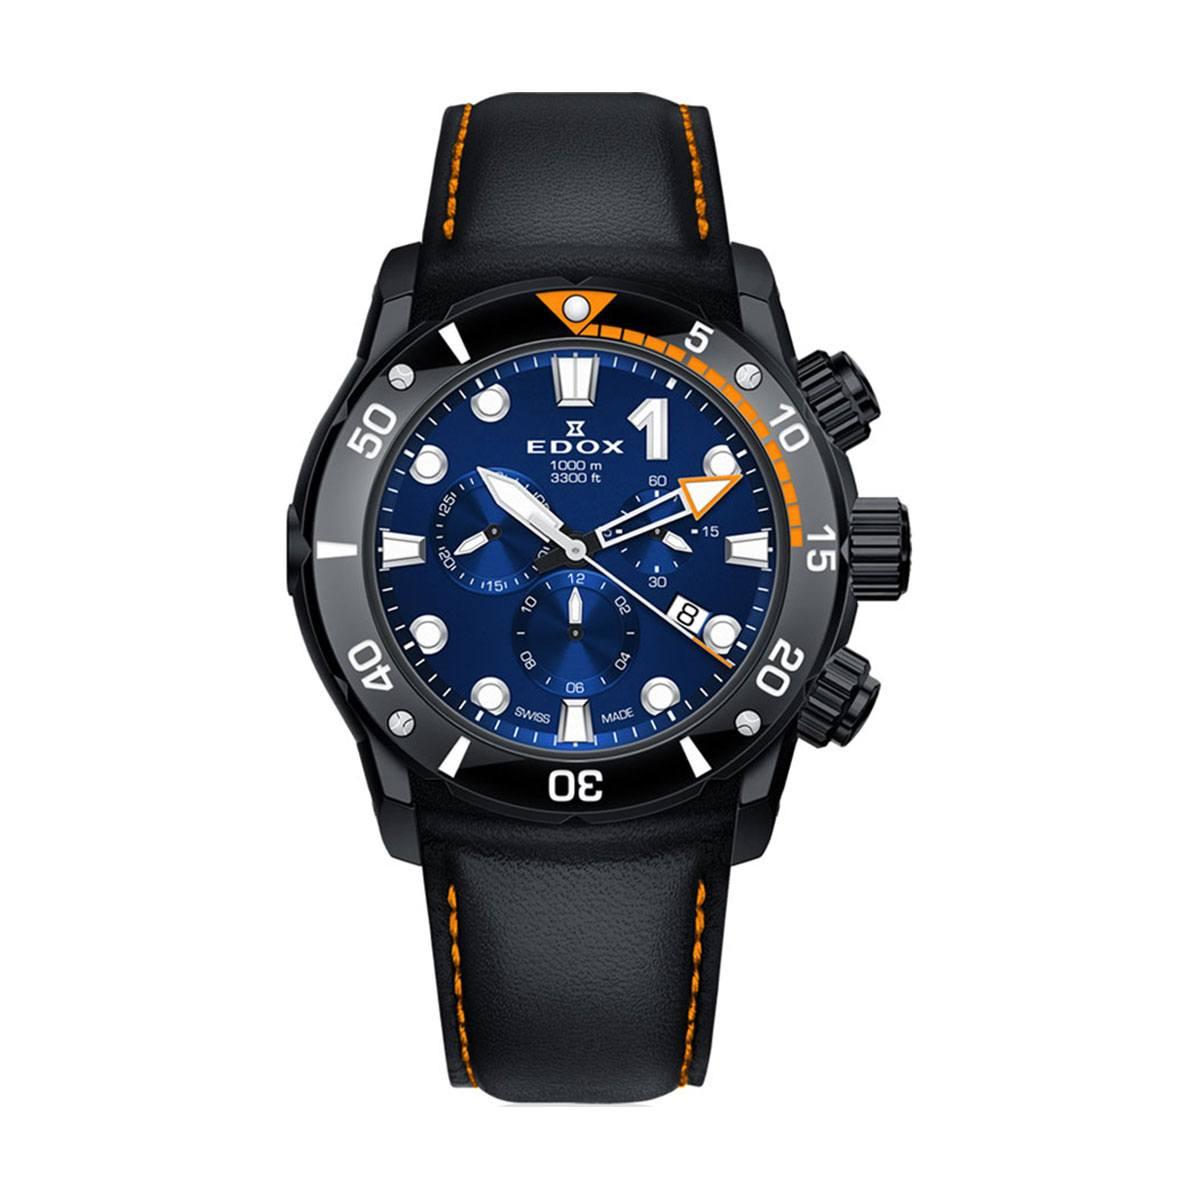 Часовник Edox 10242 TINNO BUIN